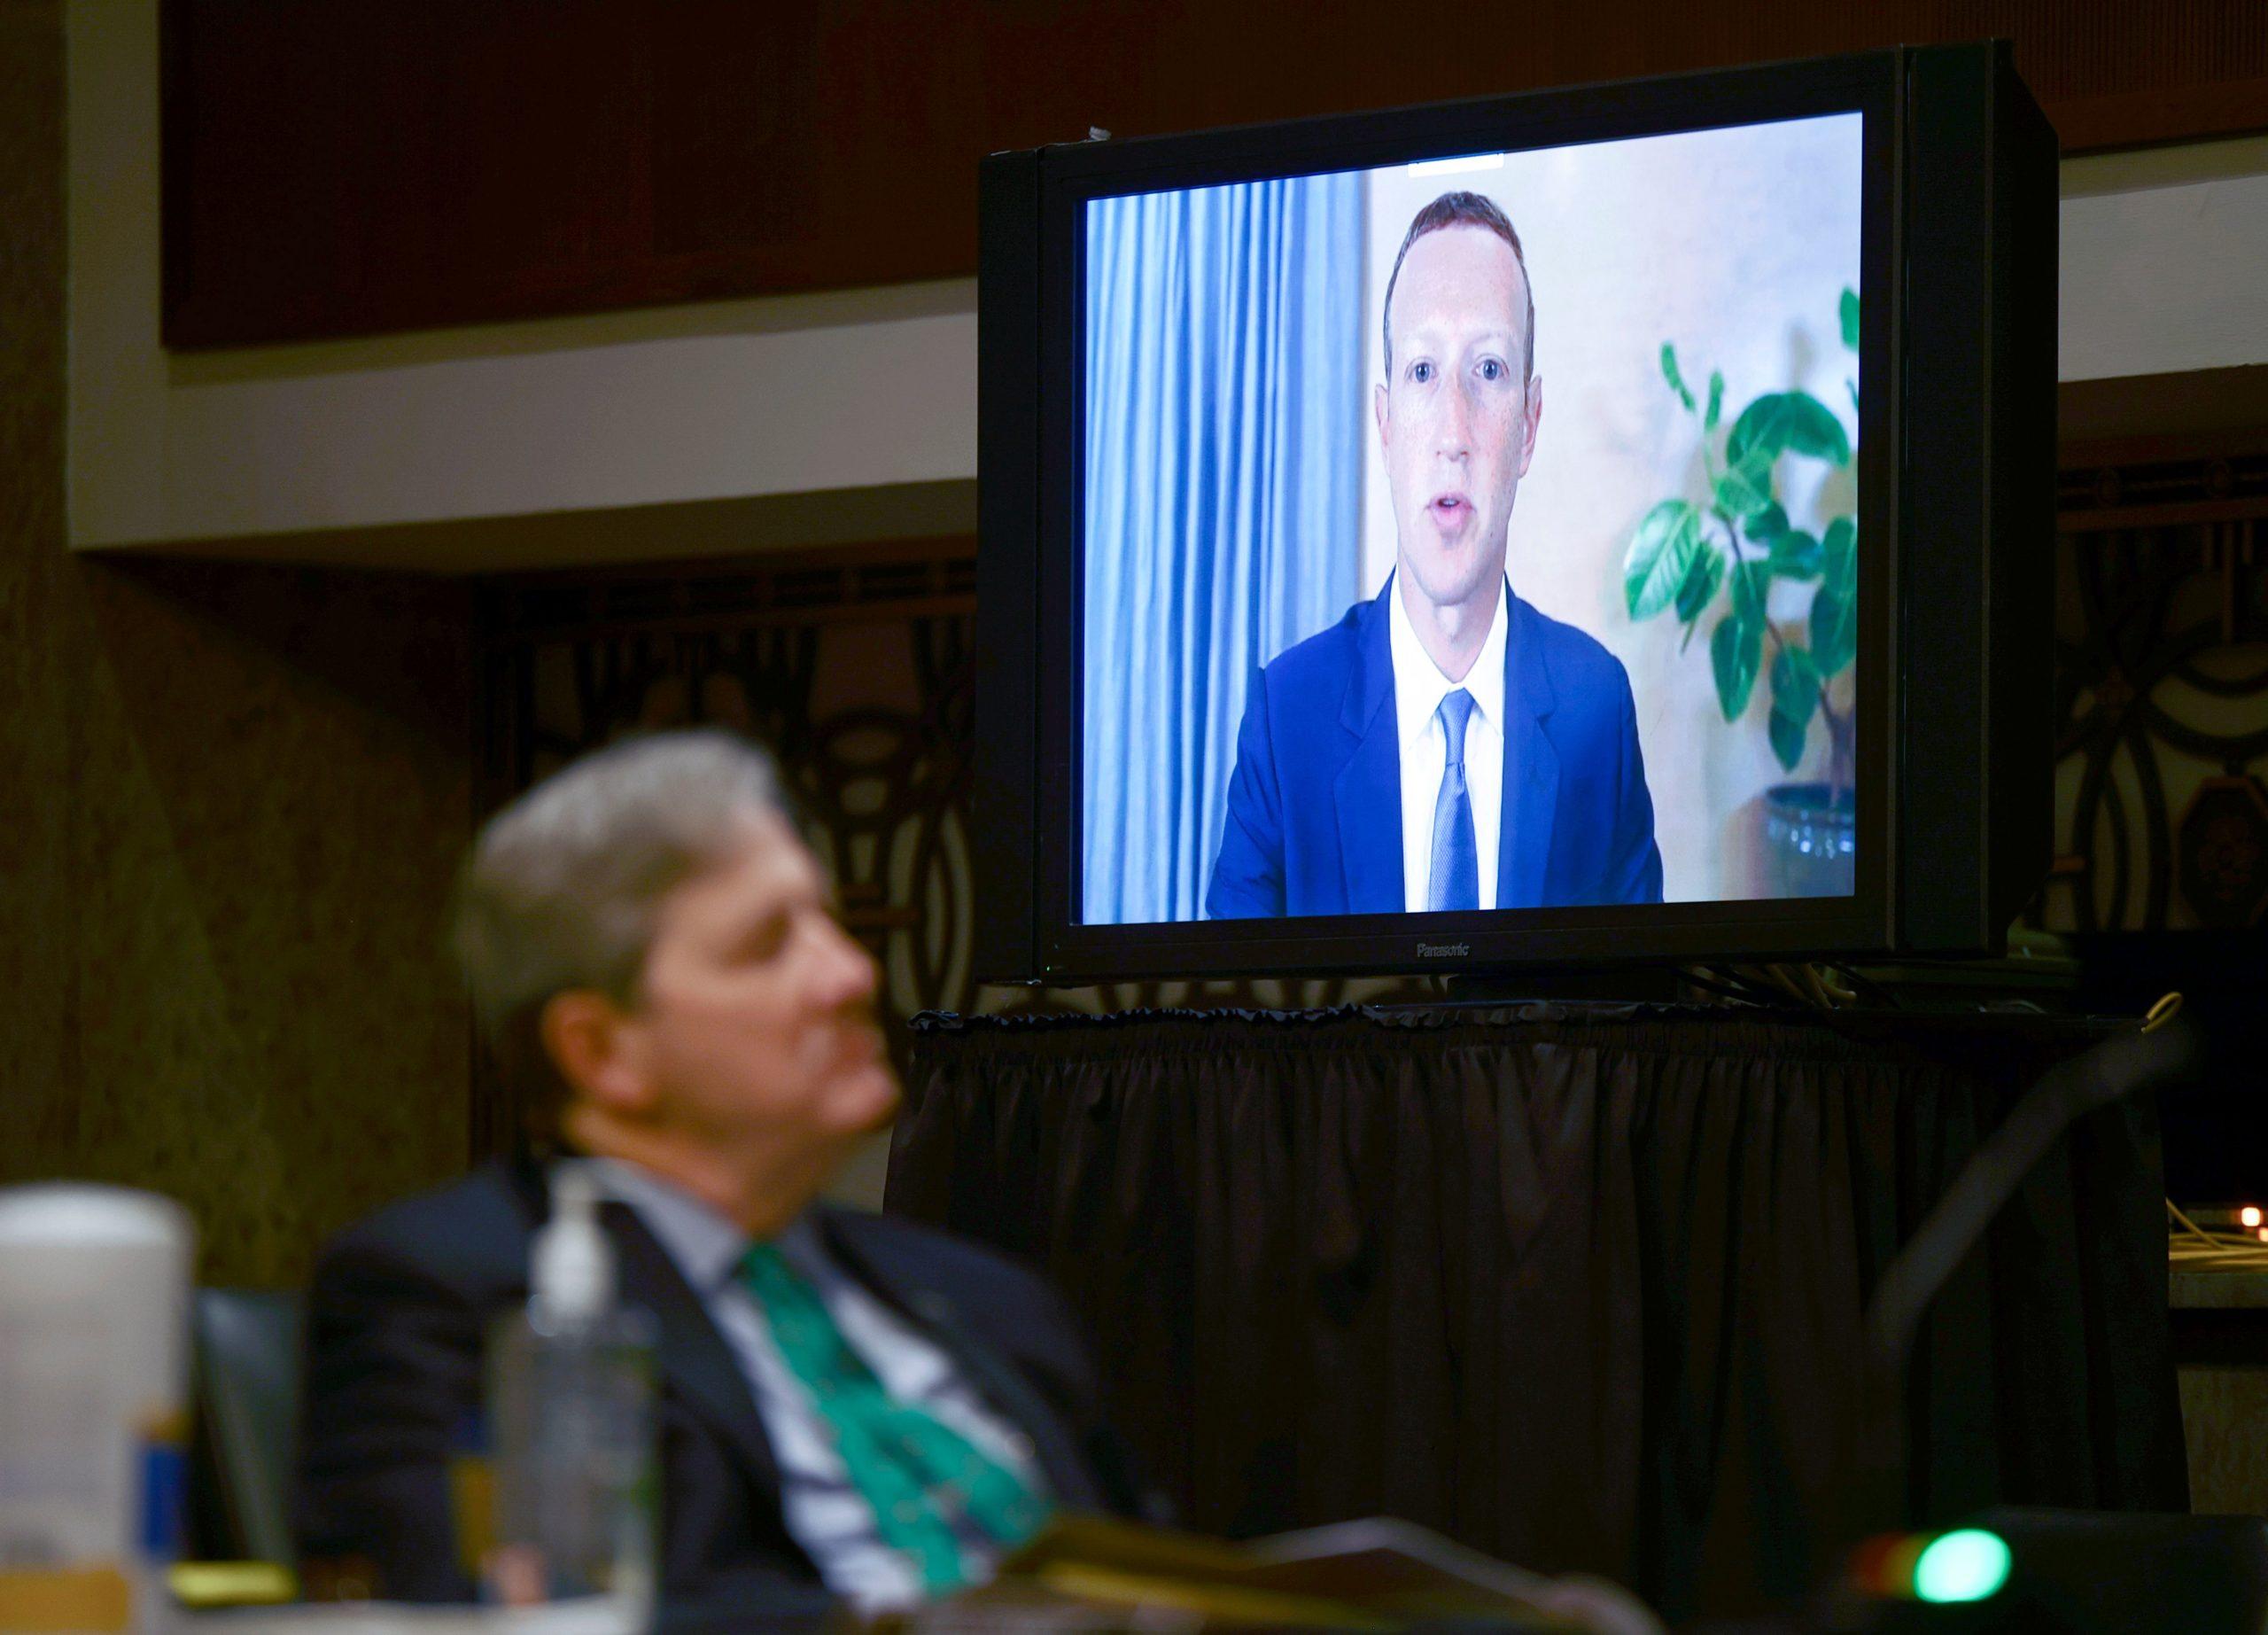 Facebook CEO Mark Zuckerberg testifies remotely during a Senate hearing. (Hannah McKay/Pool/AFP via Getty Images)